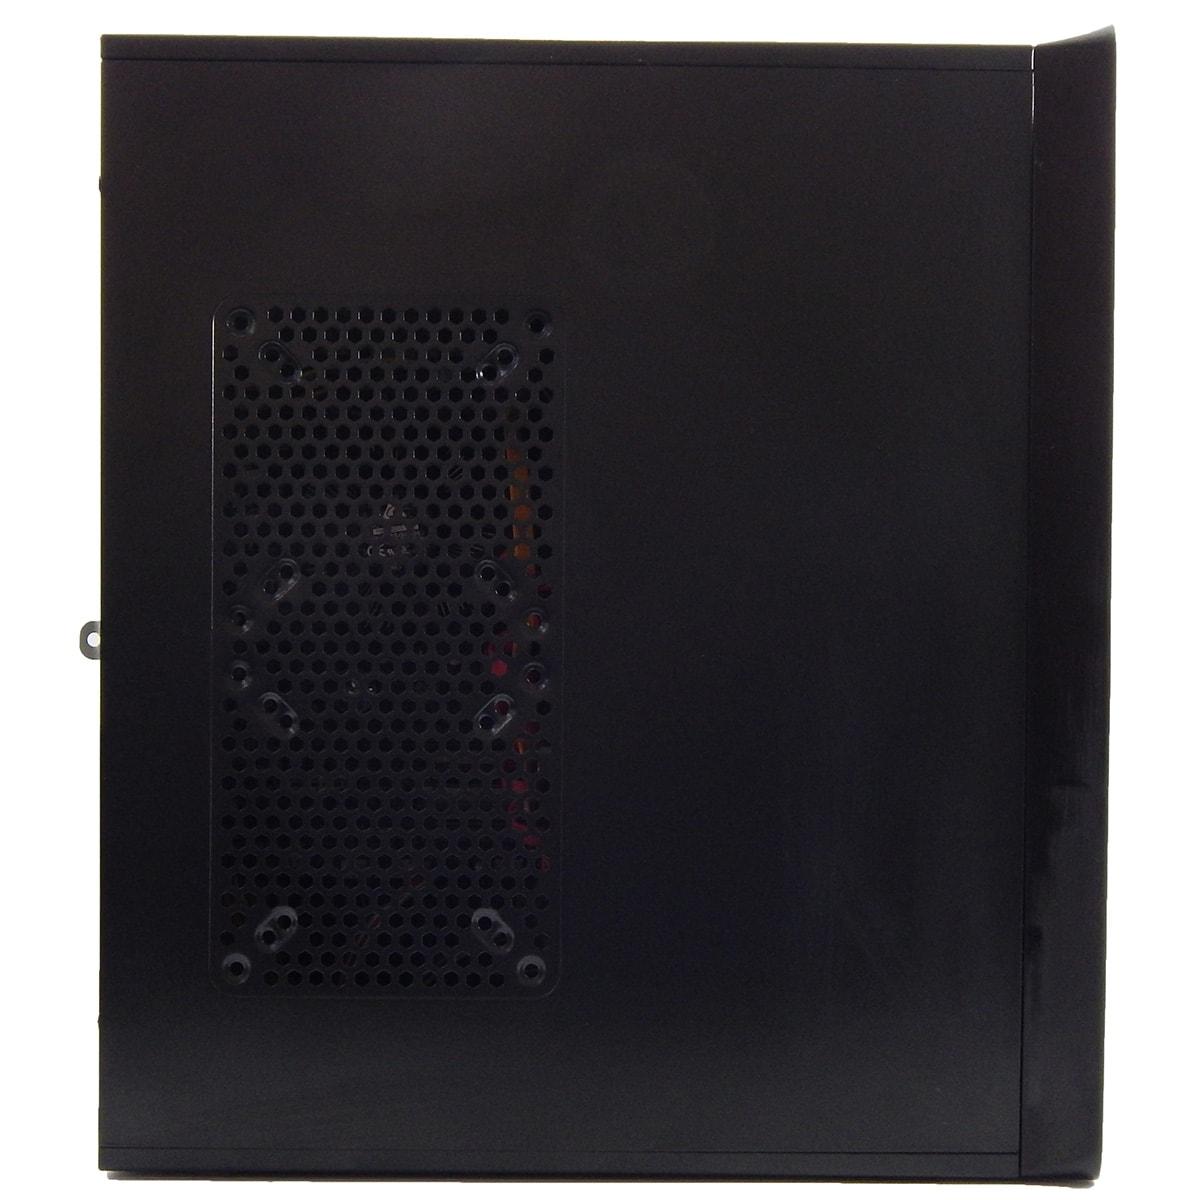 PC POSITIVO PREMIUM DRI8432 I5-4460 8Gb 500Gb Gravador DVD - Reembalado